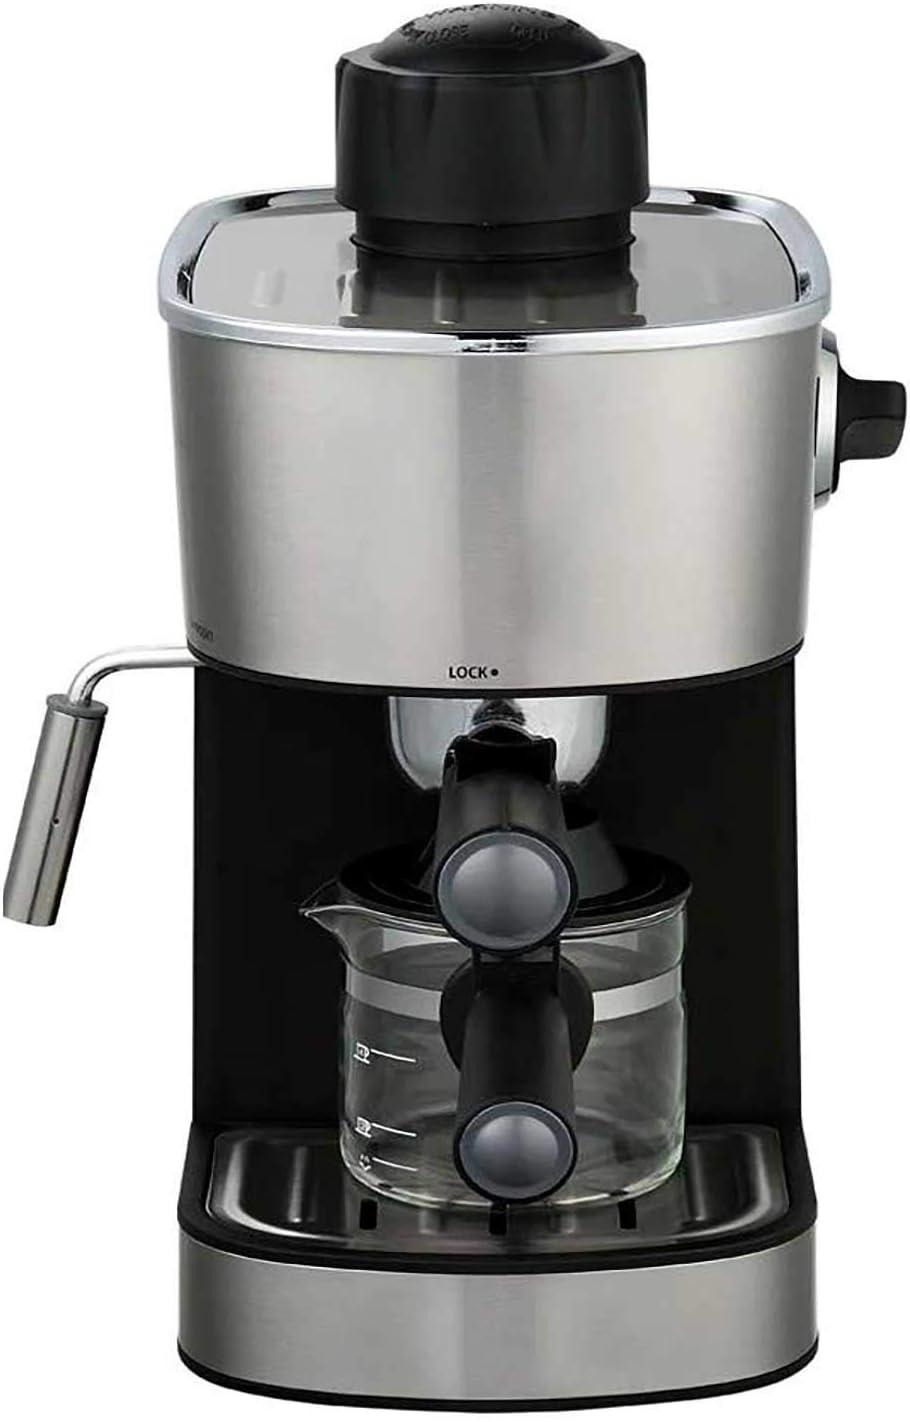 Powerful steam Espresso and Cappuccino Maker Barista Express Machine Black - Make European Espresso 61drbbcVECL